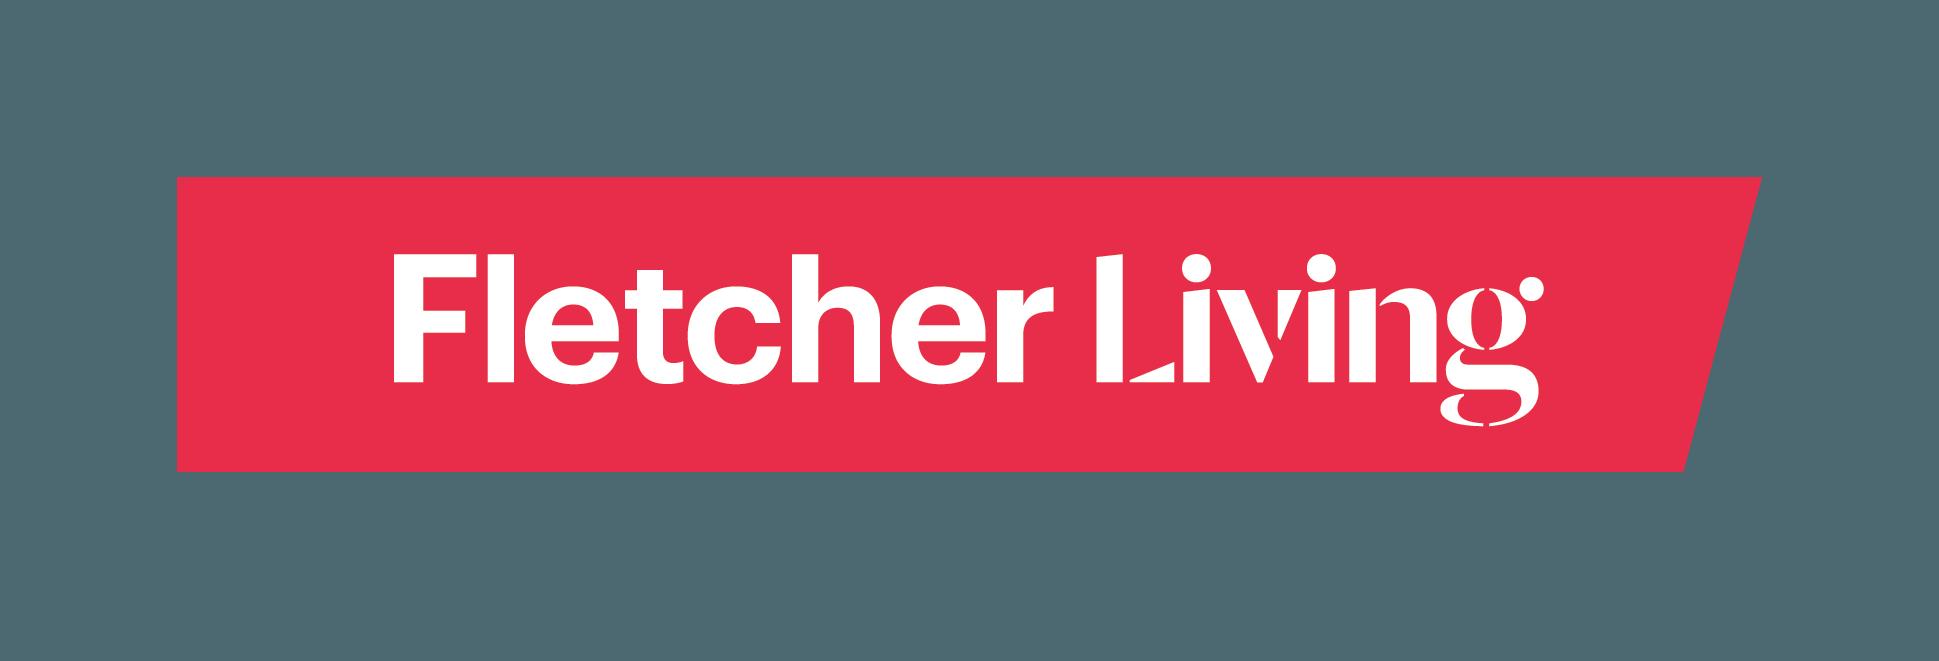 Fletcher Living